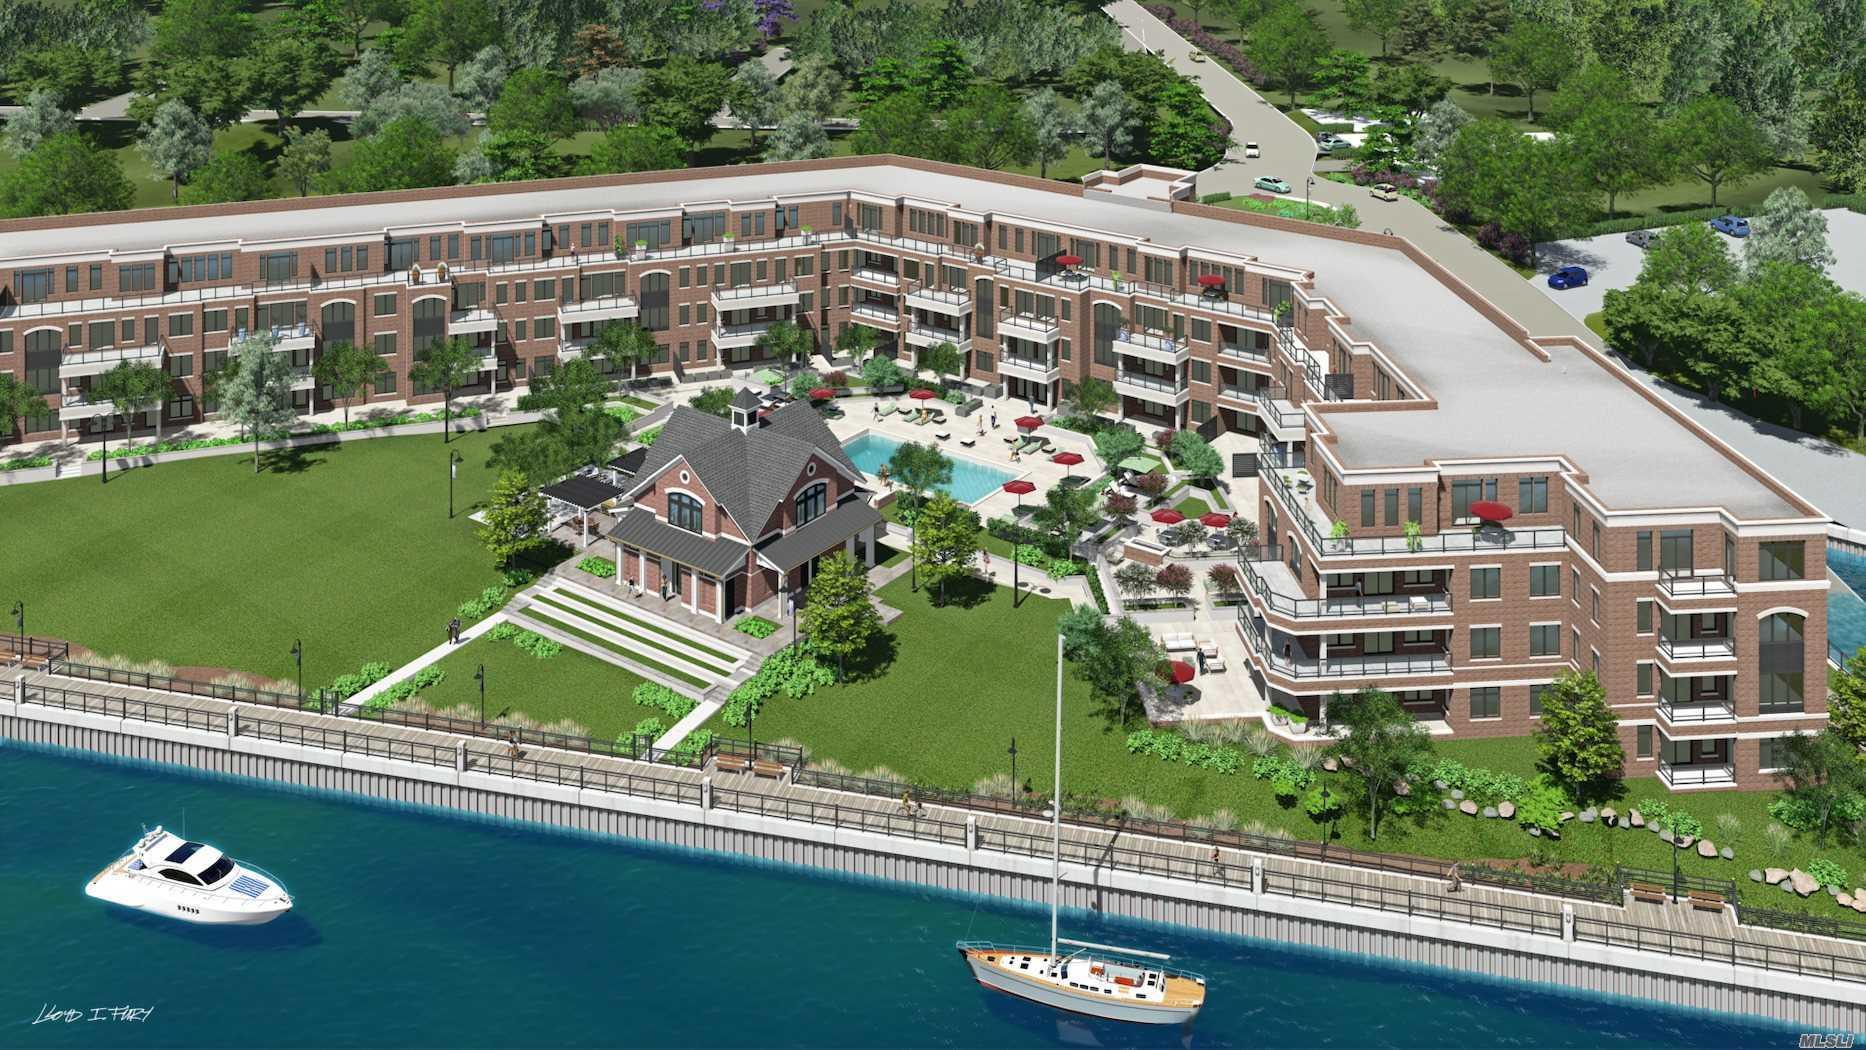 Property for sale at 10 Shore Road # 211, Glenwood Landing NY 11547, Glenwood Landing,  New York 11547